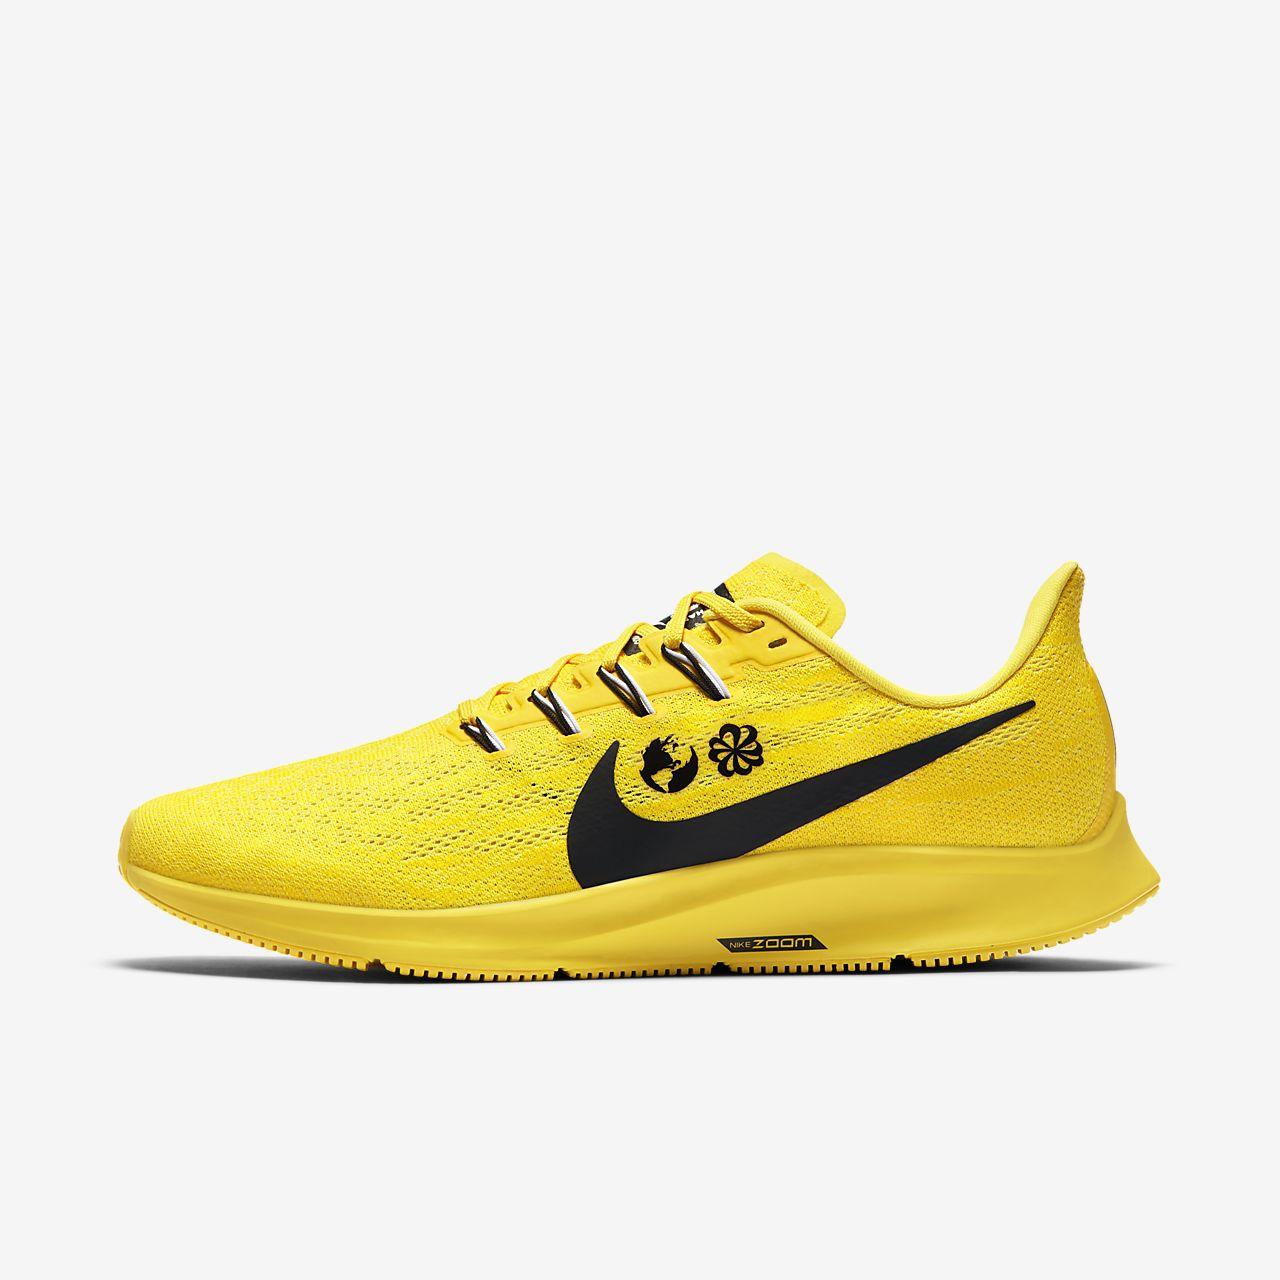 9a06f948 Nike Air Zoom Pegasus 36 Zapatillas de running - Hombre